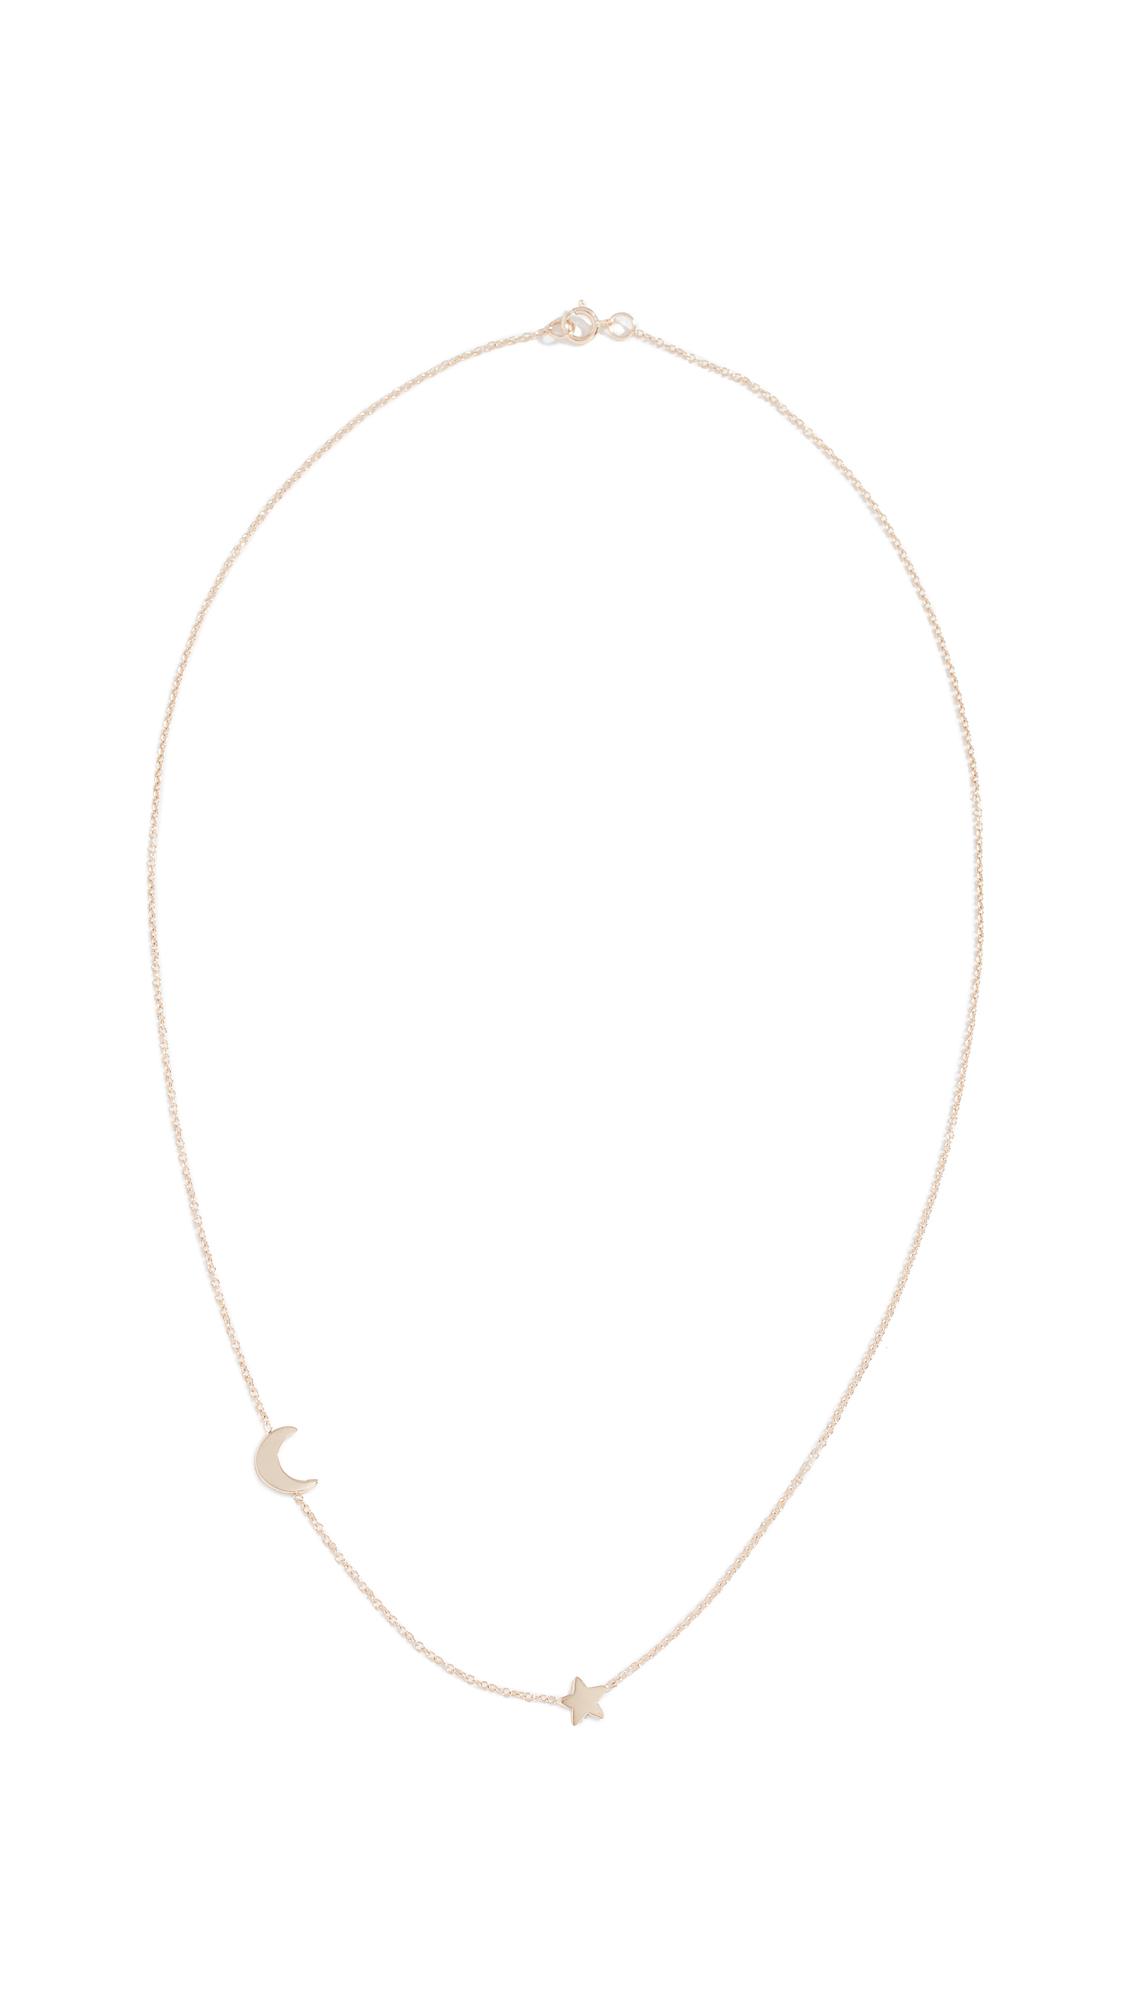 ARIEL GORDON JEWELRY 14K Starry Night Necklace in Yellow Gold